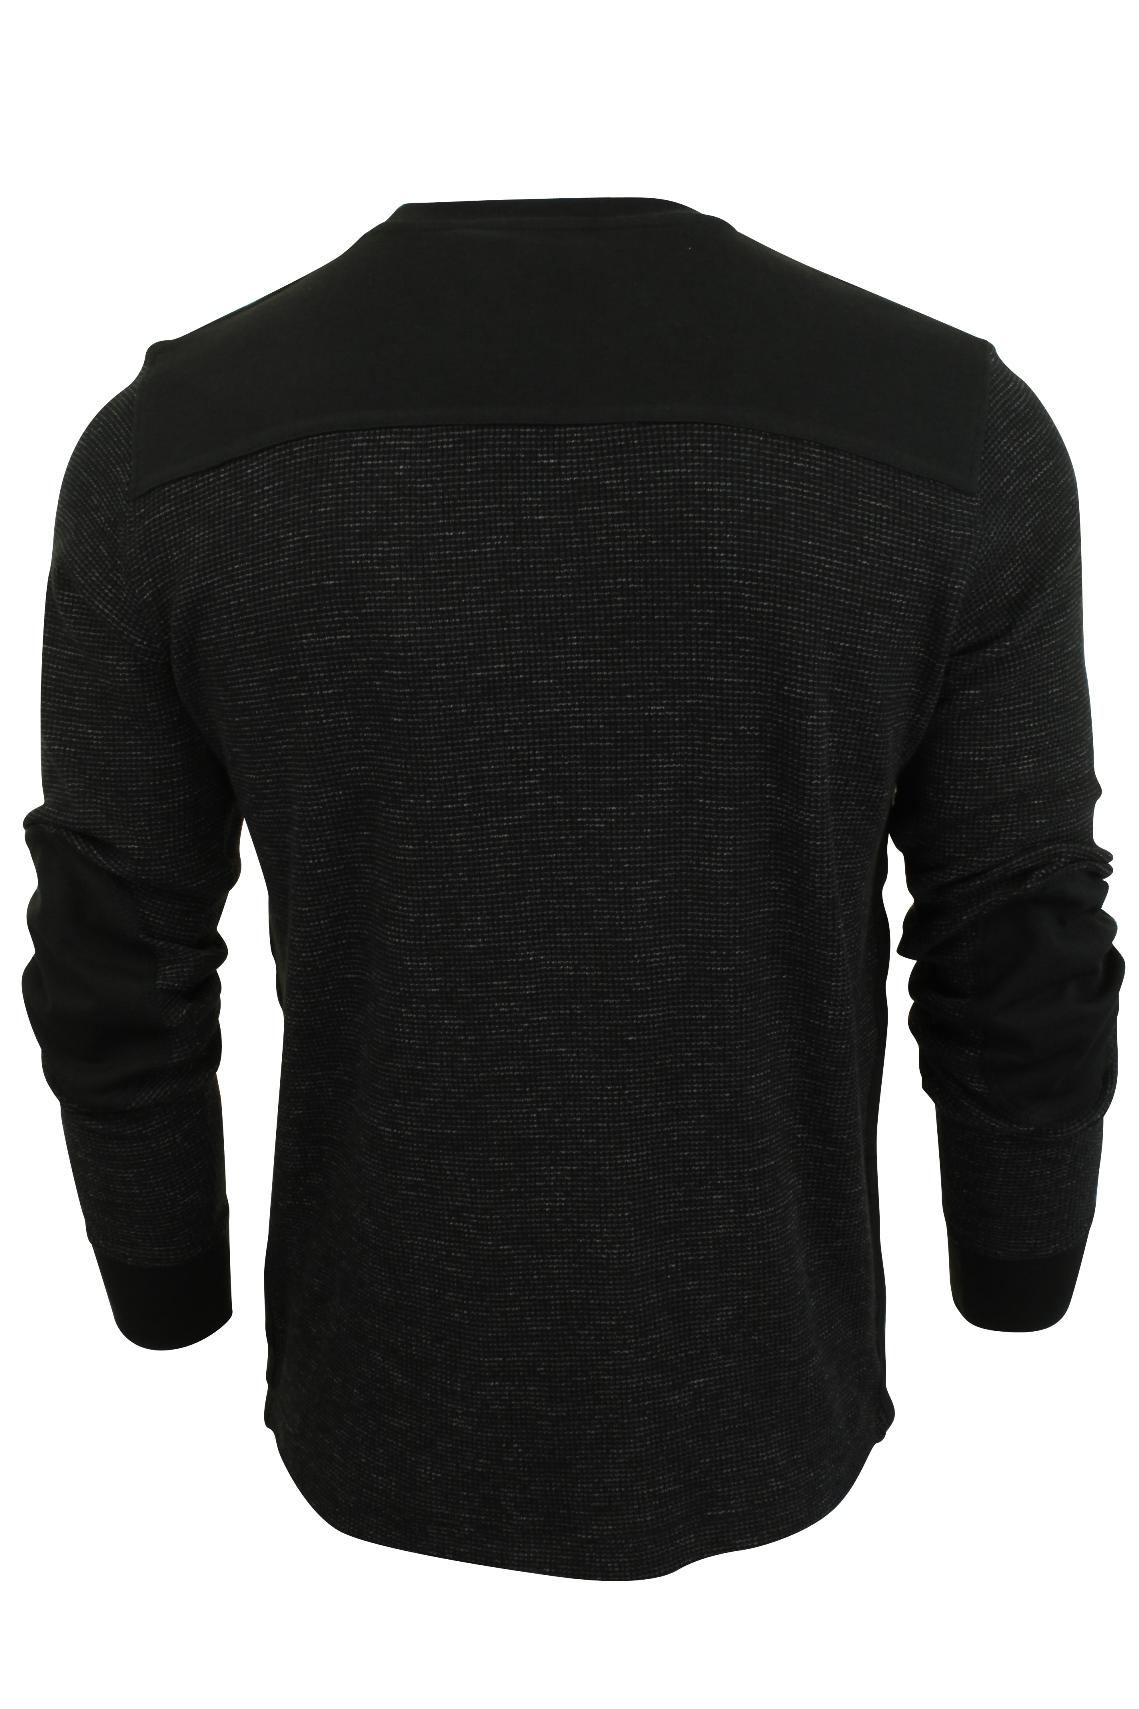 Men/'s Jumper Cotton Rich Fashion Sweater by Brave Soul